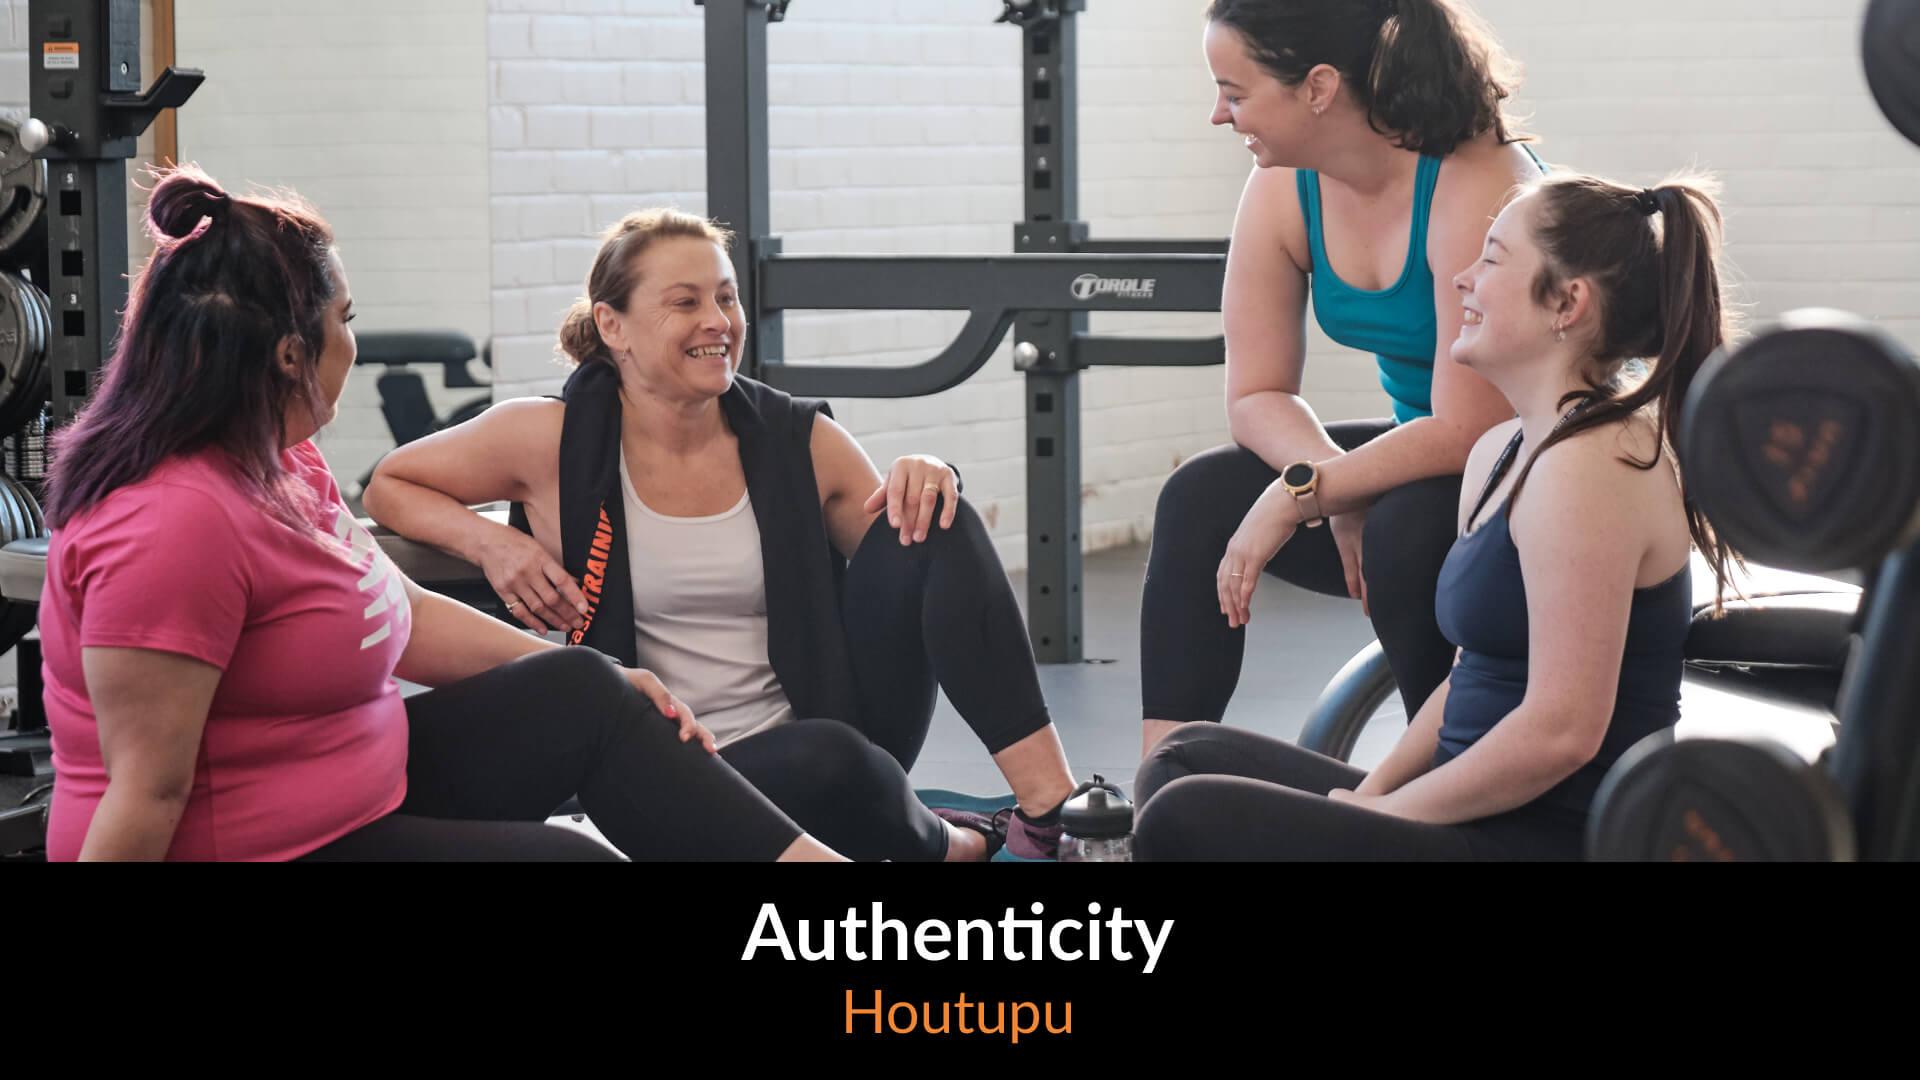 Four female gym members sitting on a gym mat talking